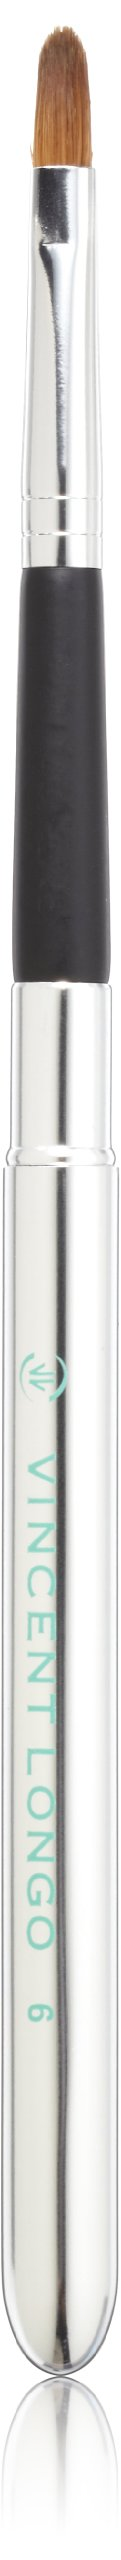 VINCENT LONGO Travel Precision Lip Brush No. 6